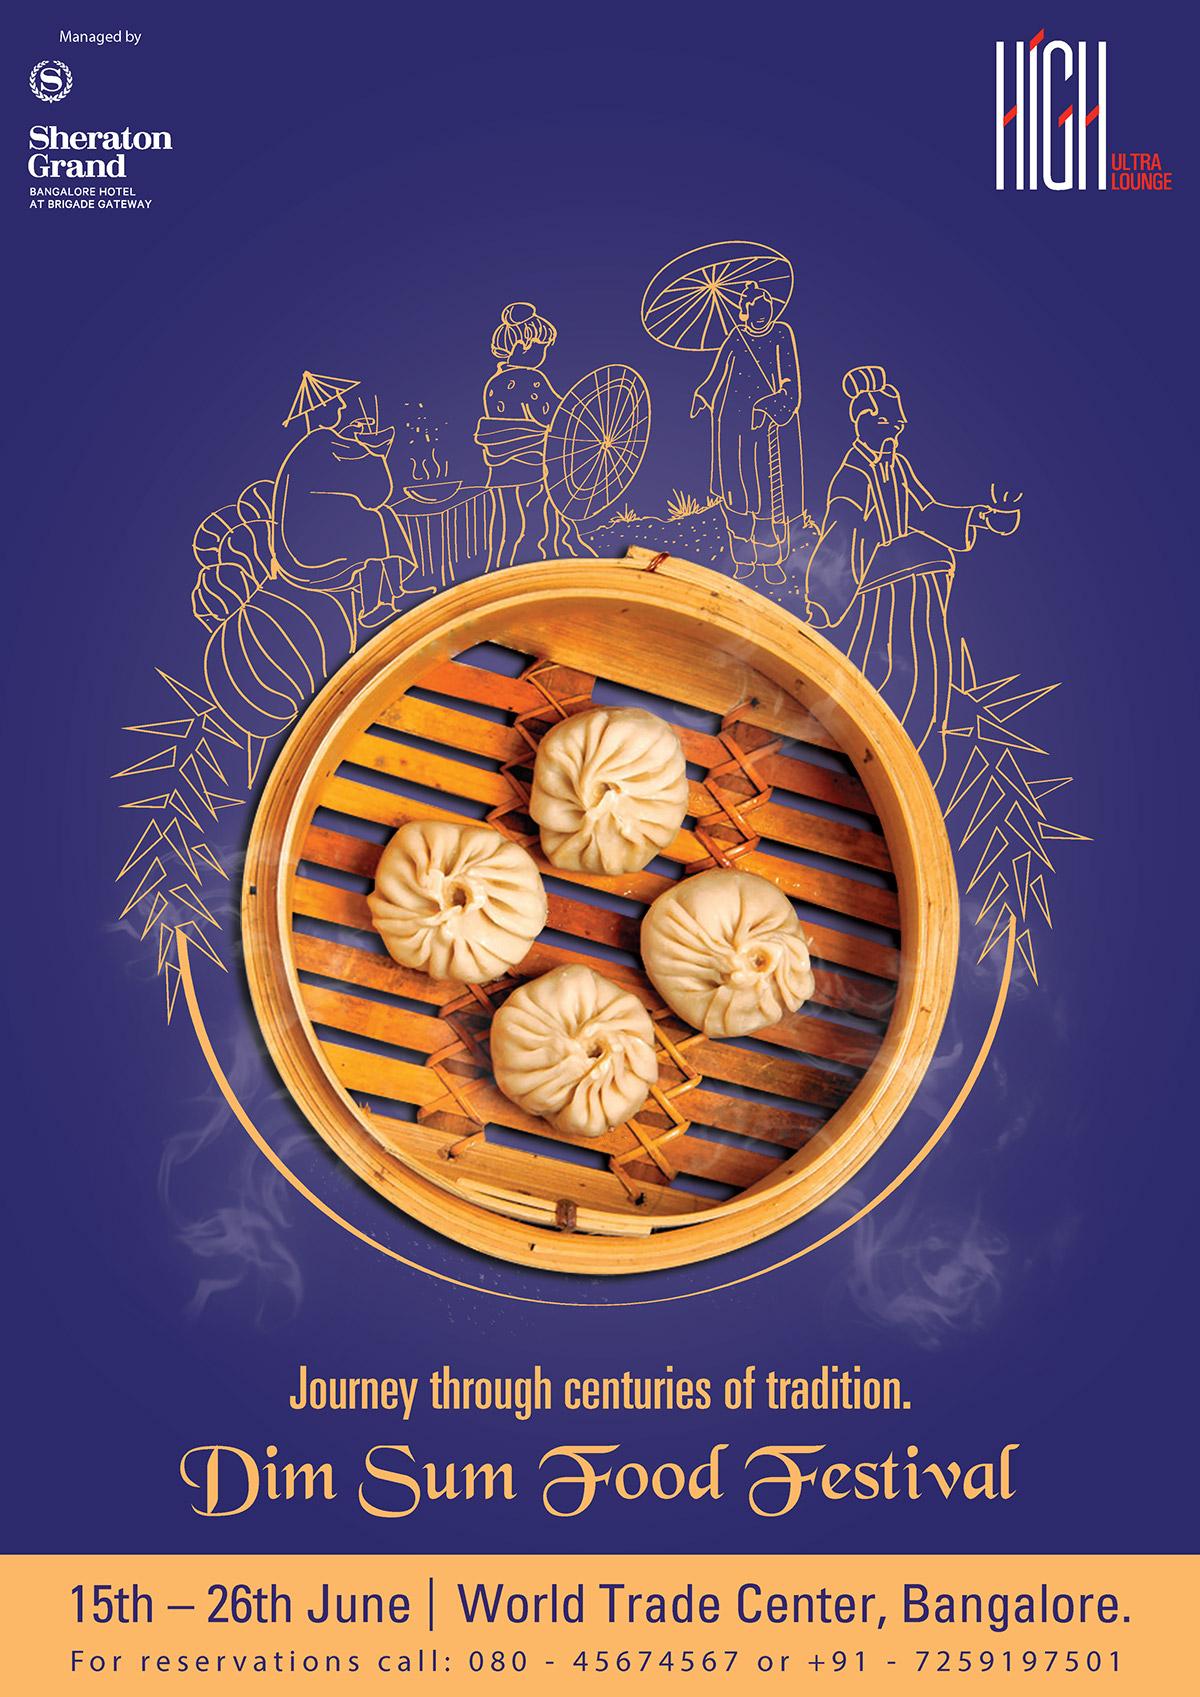 Dim Sum Food Festival poster design on Behance